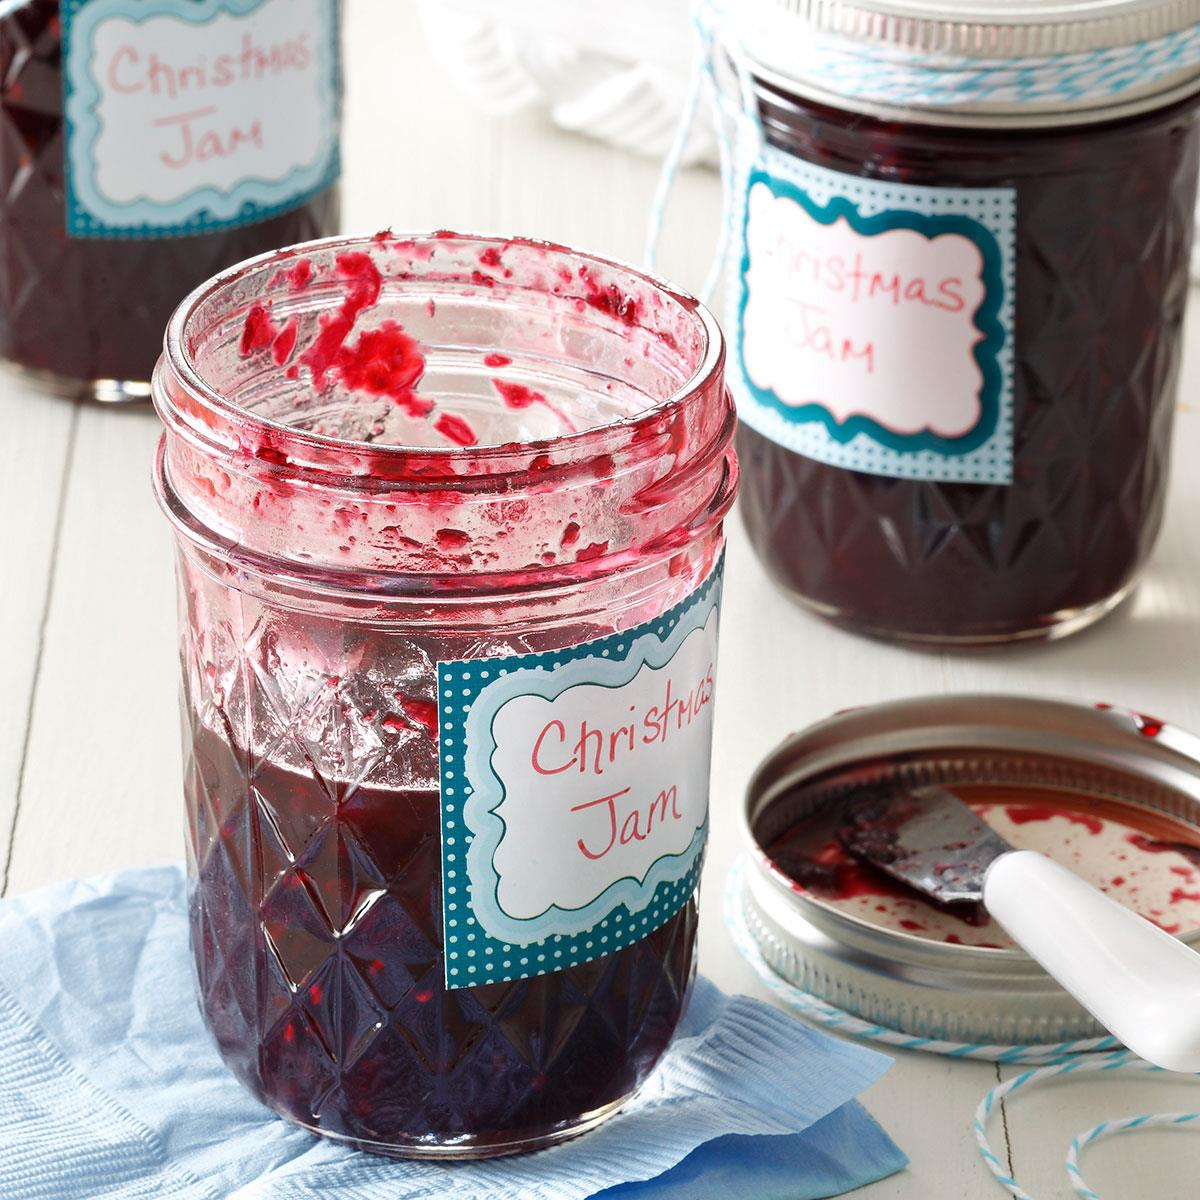 Homemade Christmas Jam Recipe How To Make It Taste Of Home